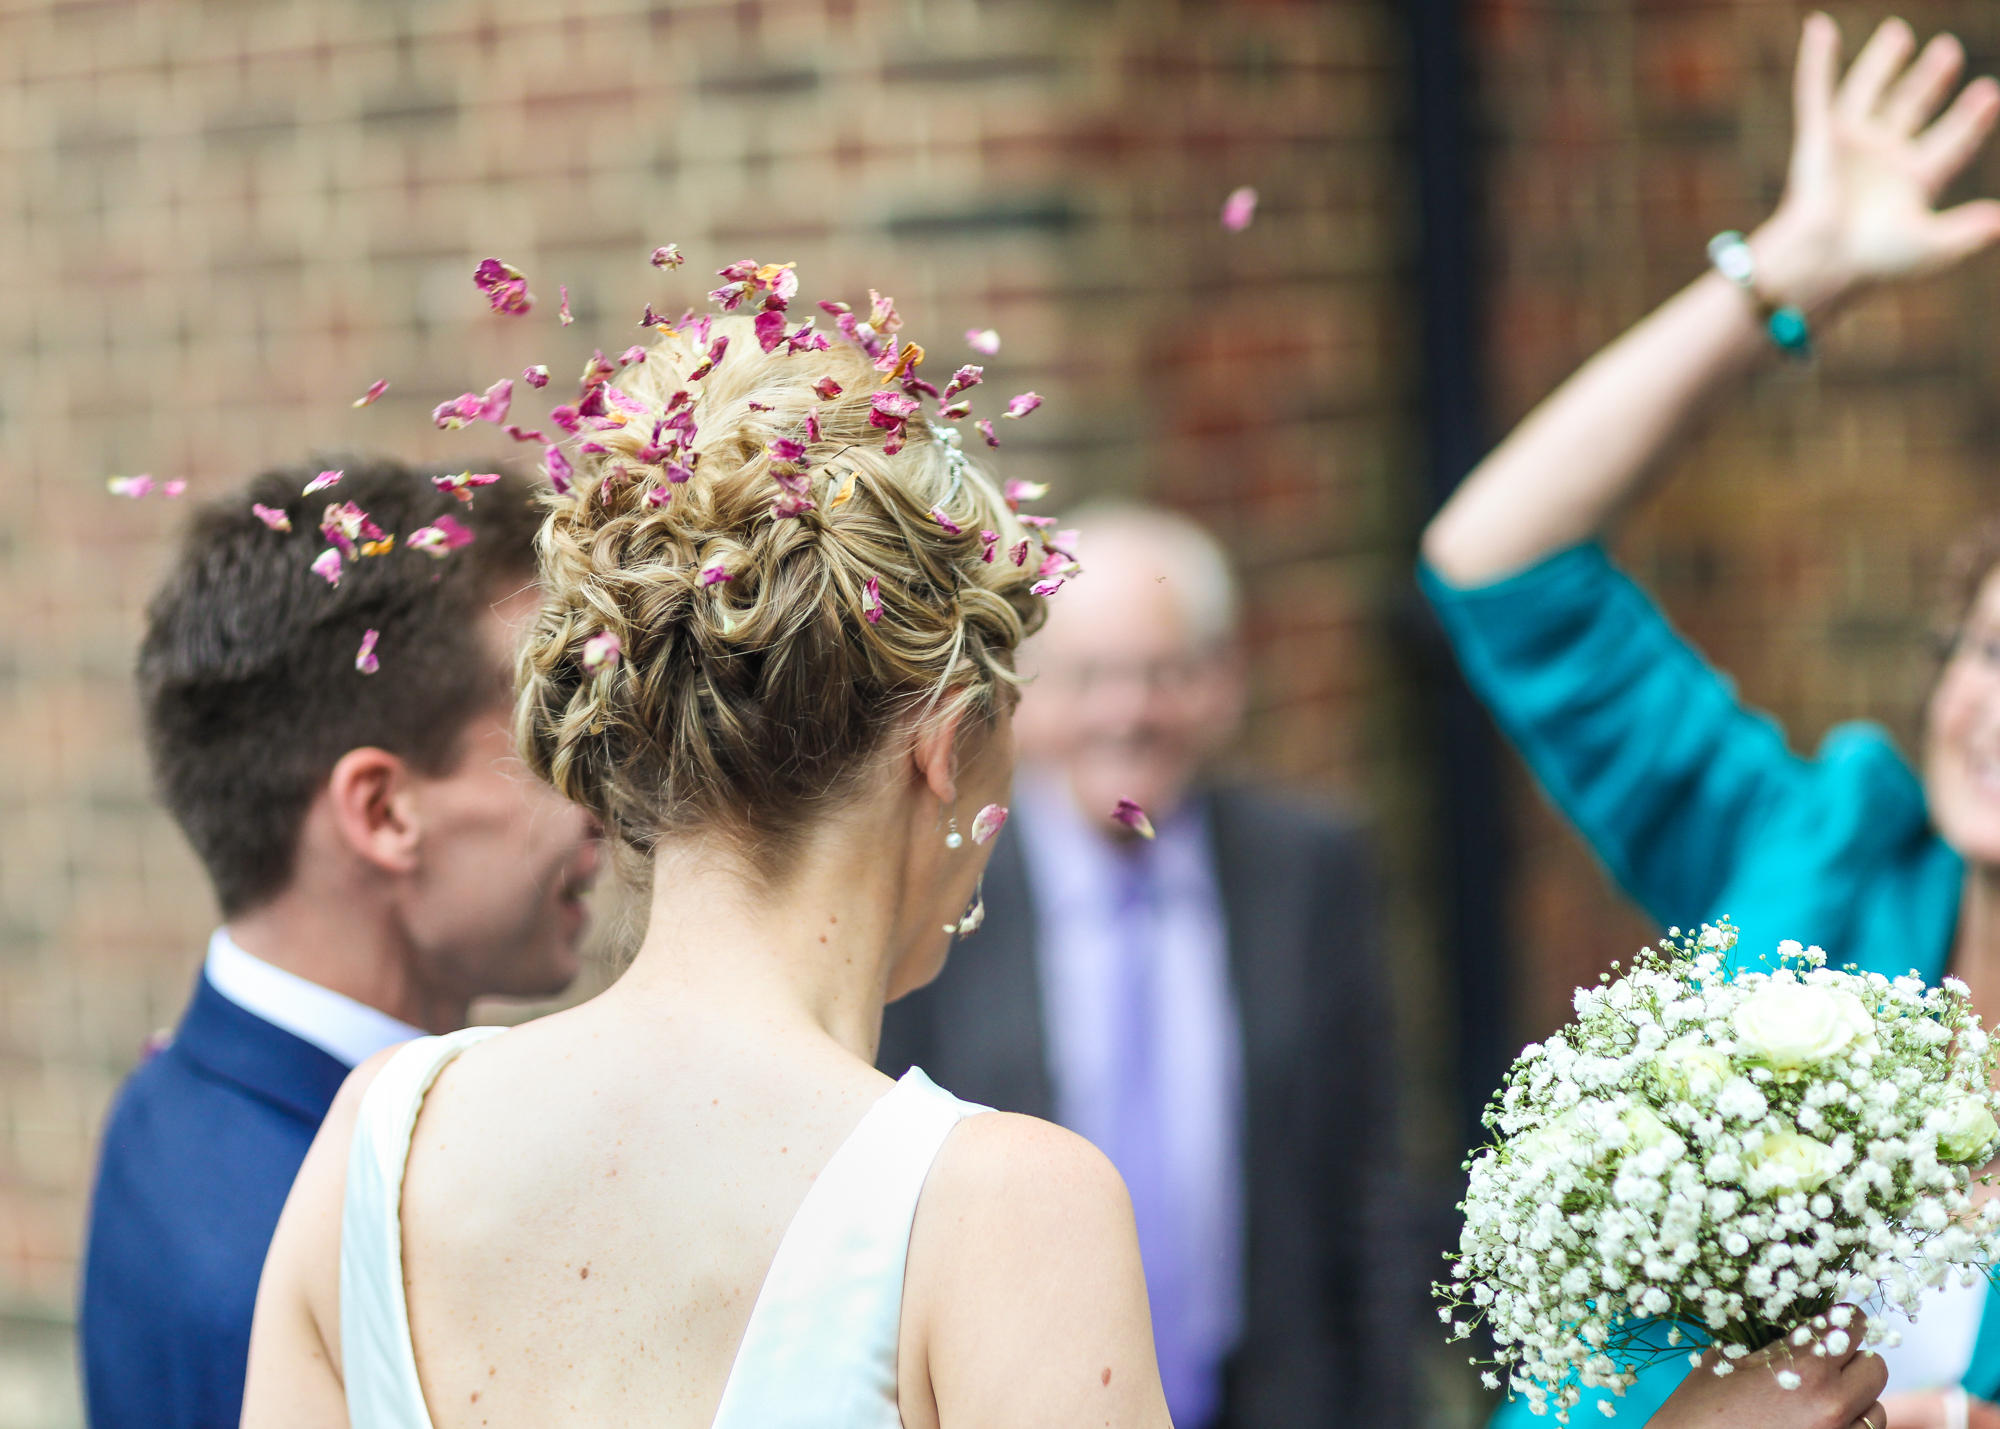 wedding photography bridal (3 of 5).jpg